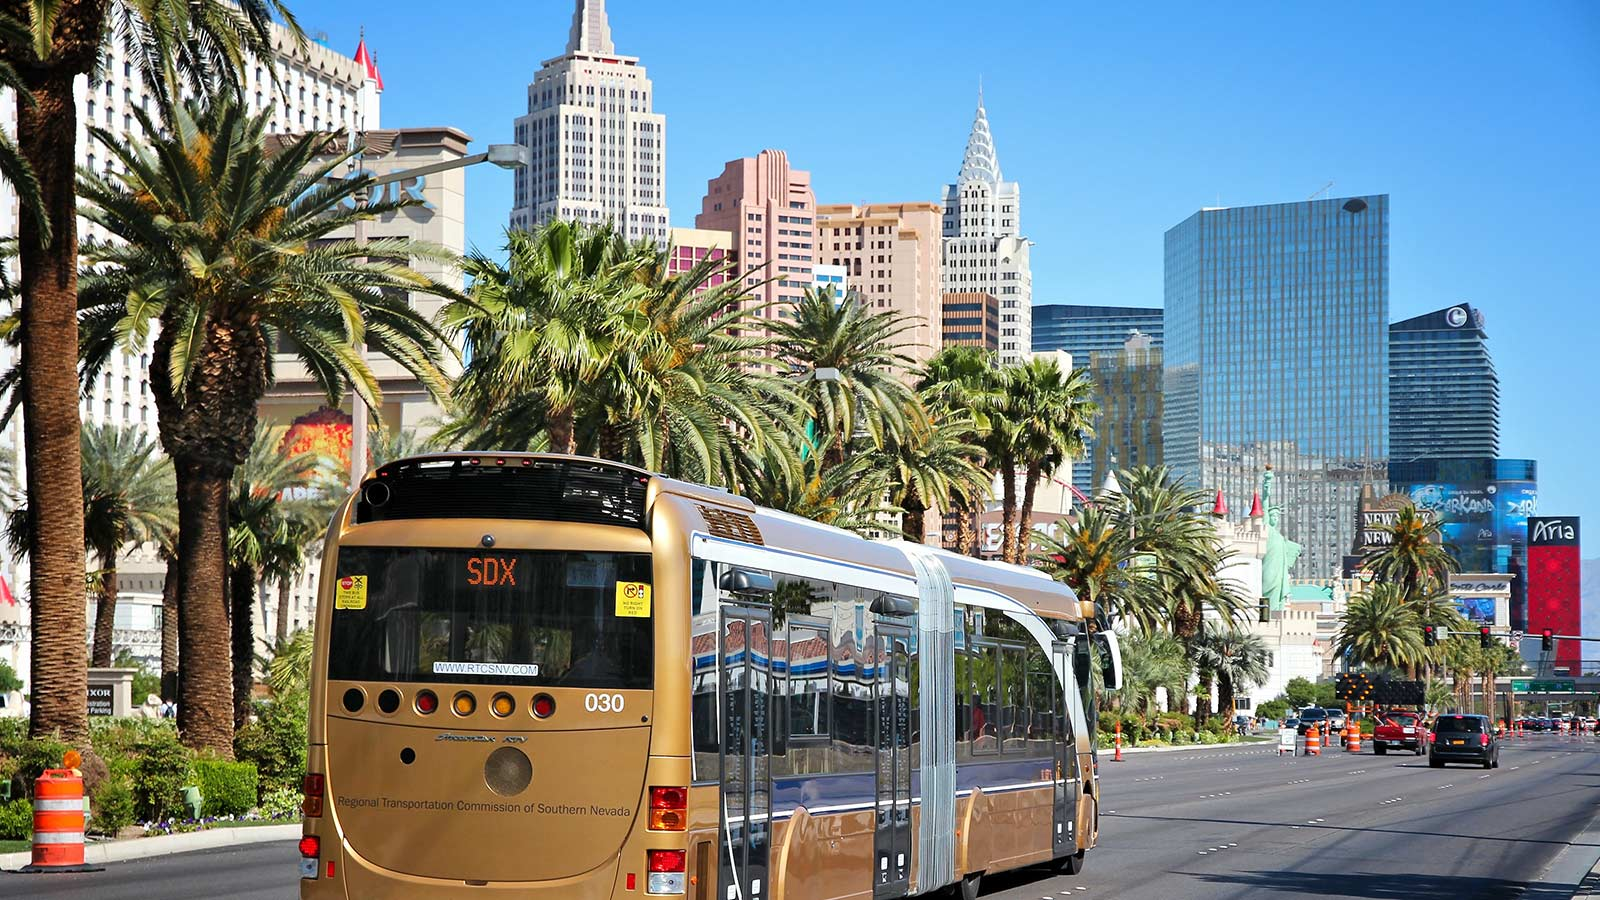 Public bus driving down the street in Las Vegas